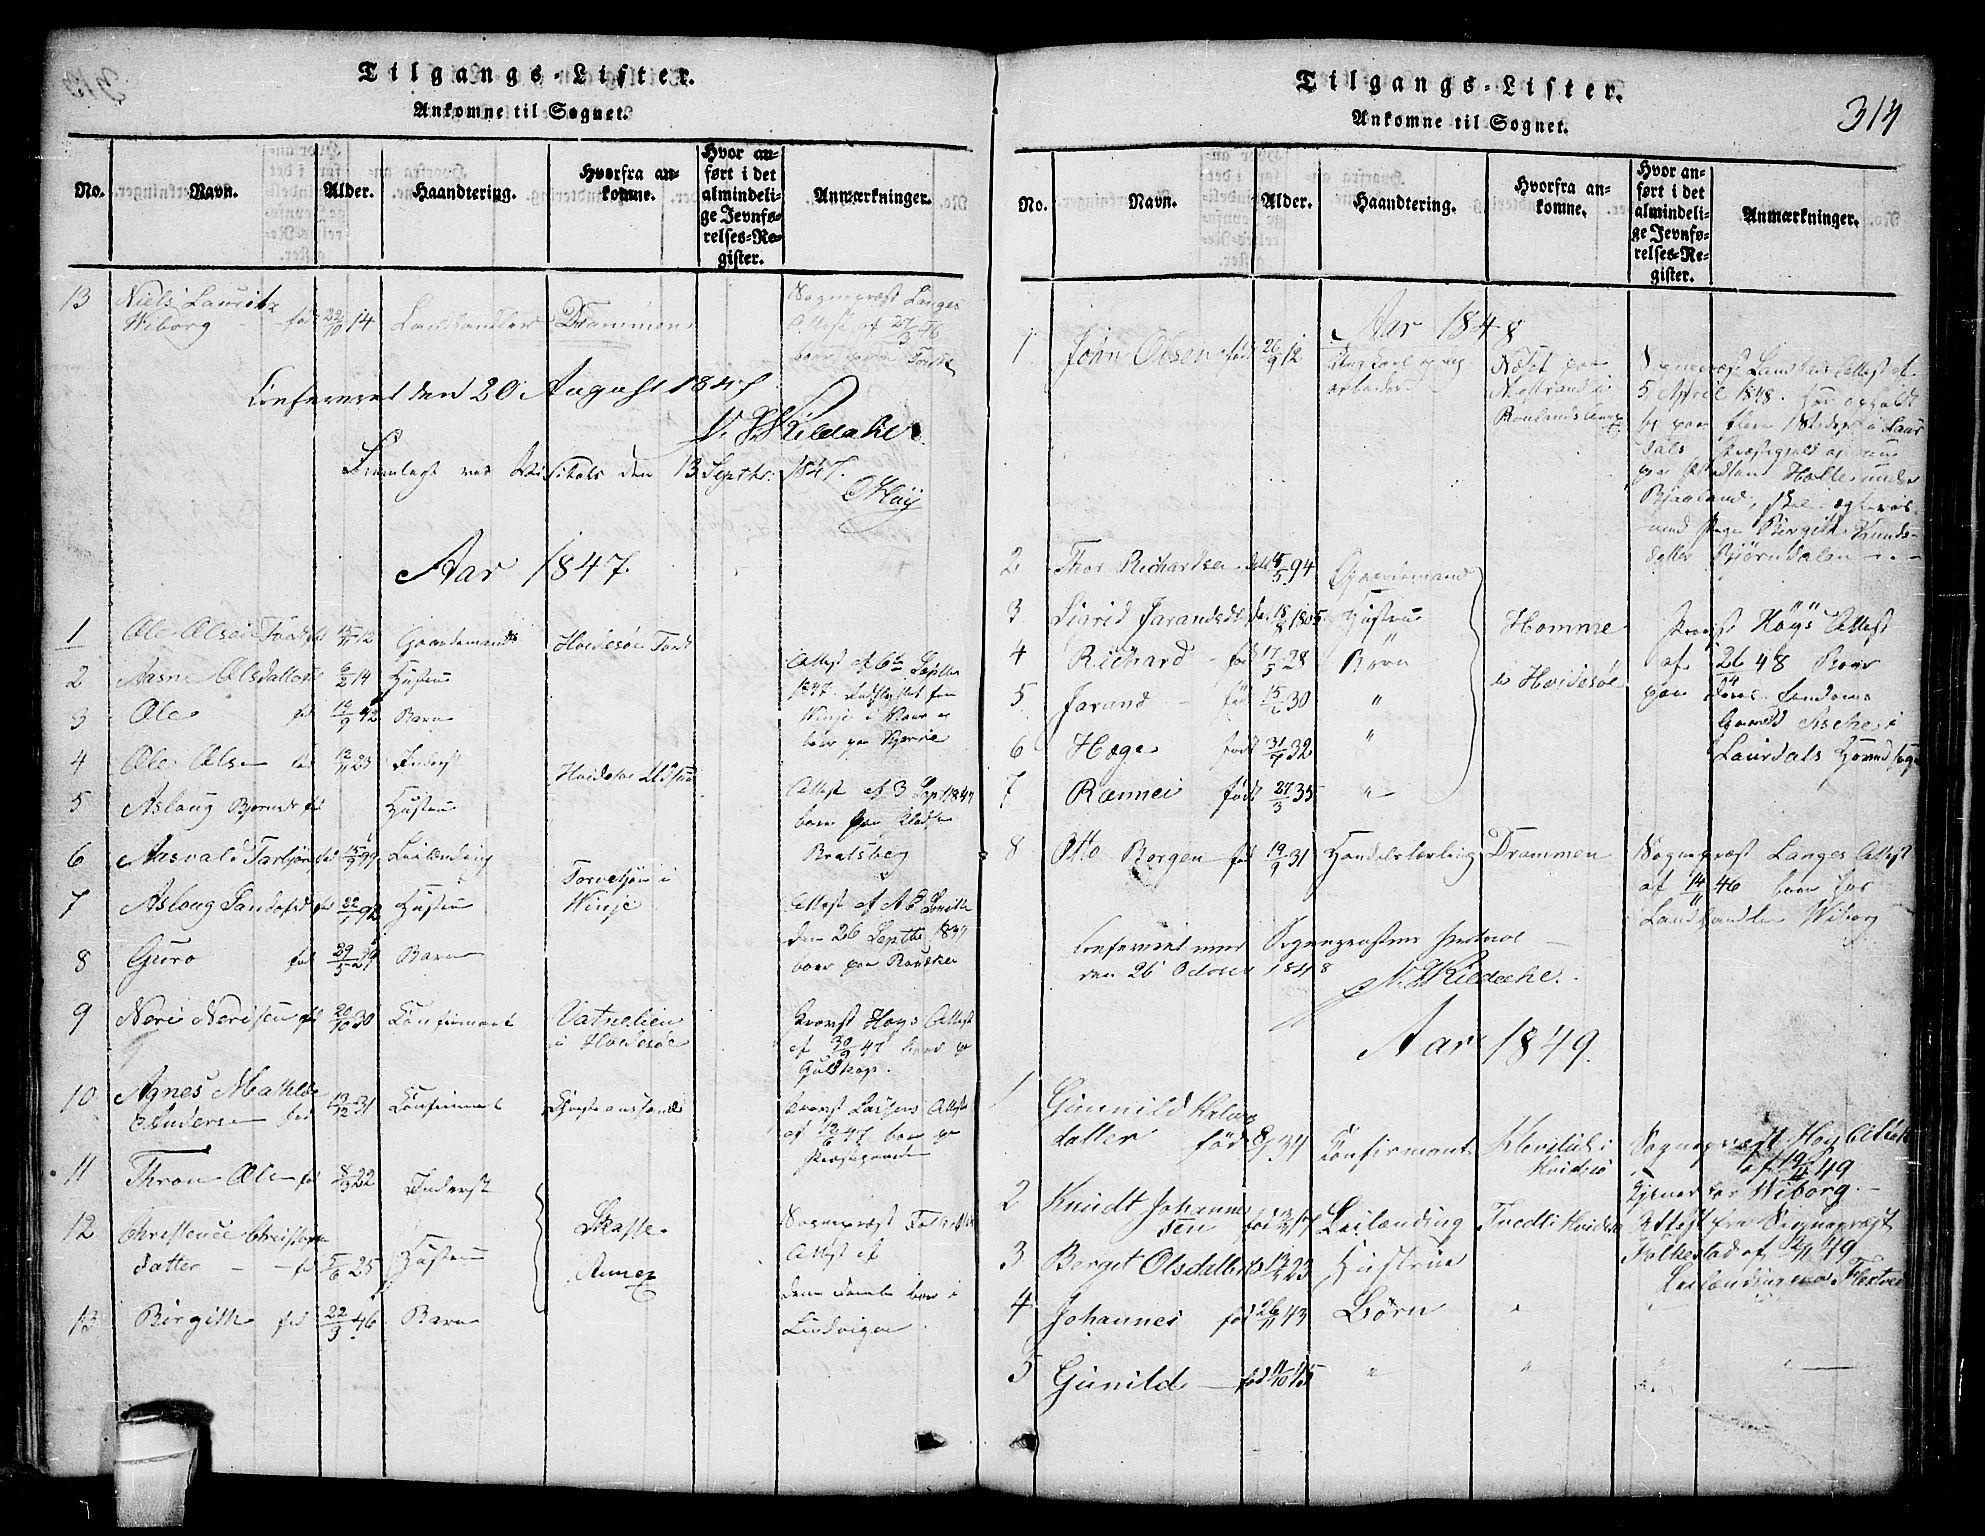 SAKO, Lårdal kirkebøker, G/Ga/L0001: Klokkerbok nr. I 1, 1815-1861, s. 314